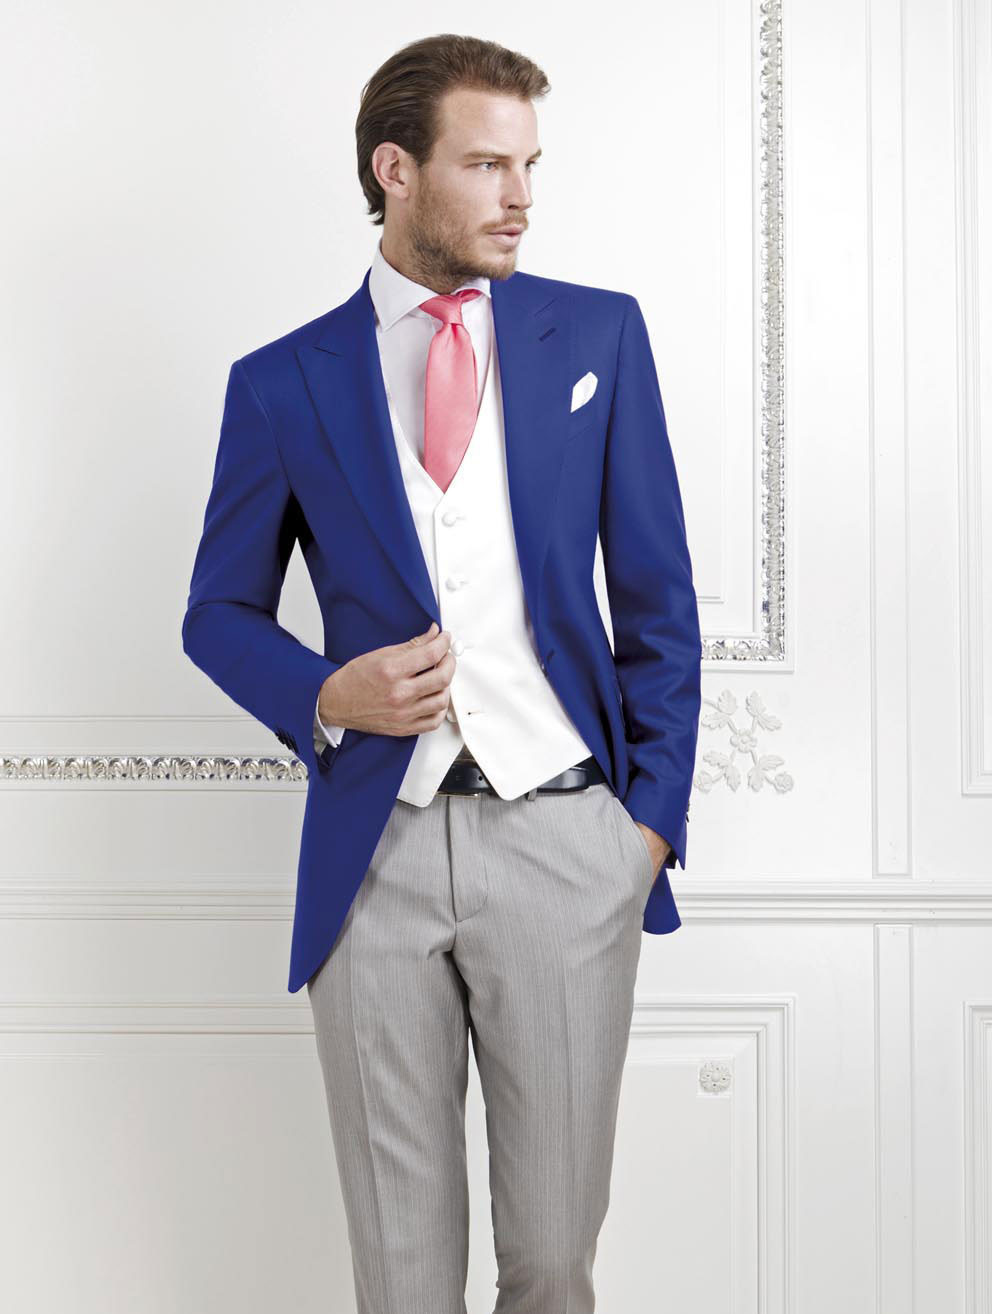 Vestito Matrimonio Uomo Tight : New arrival royal blue groom tuxedos groomsmen mens